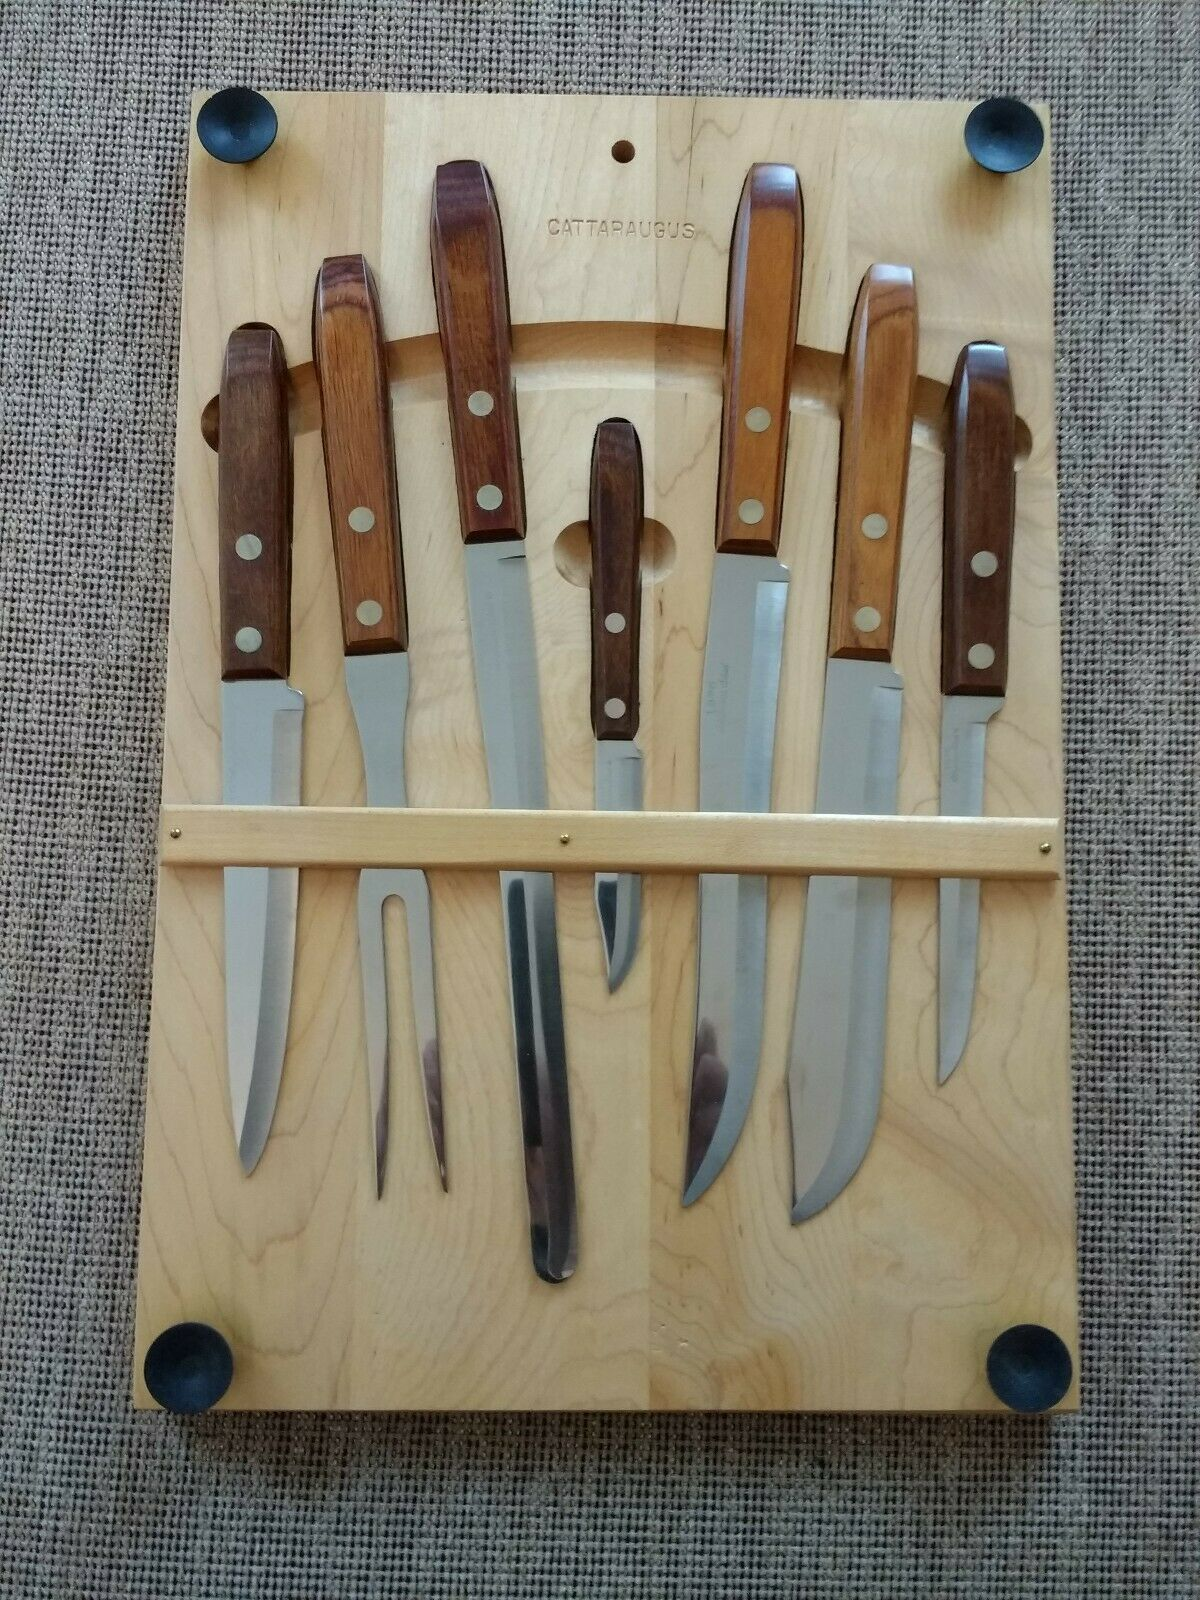 Cattaraugus Cutlery Set Knives & Cutting Board